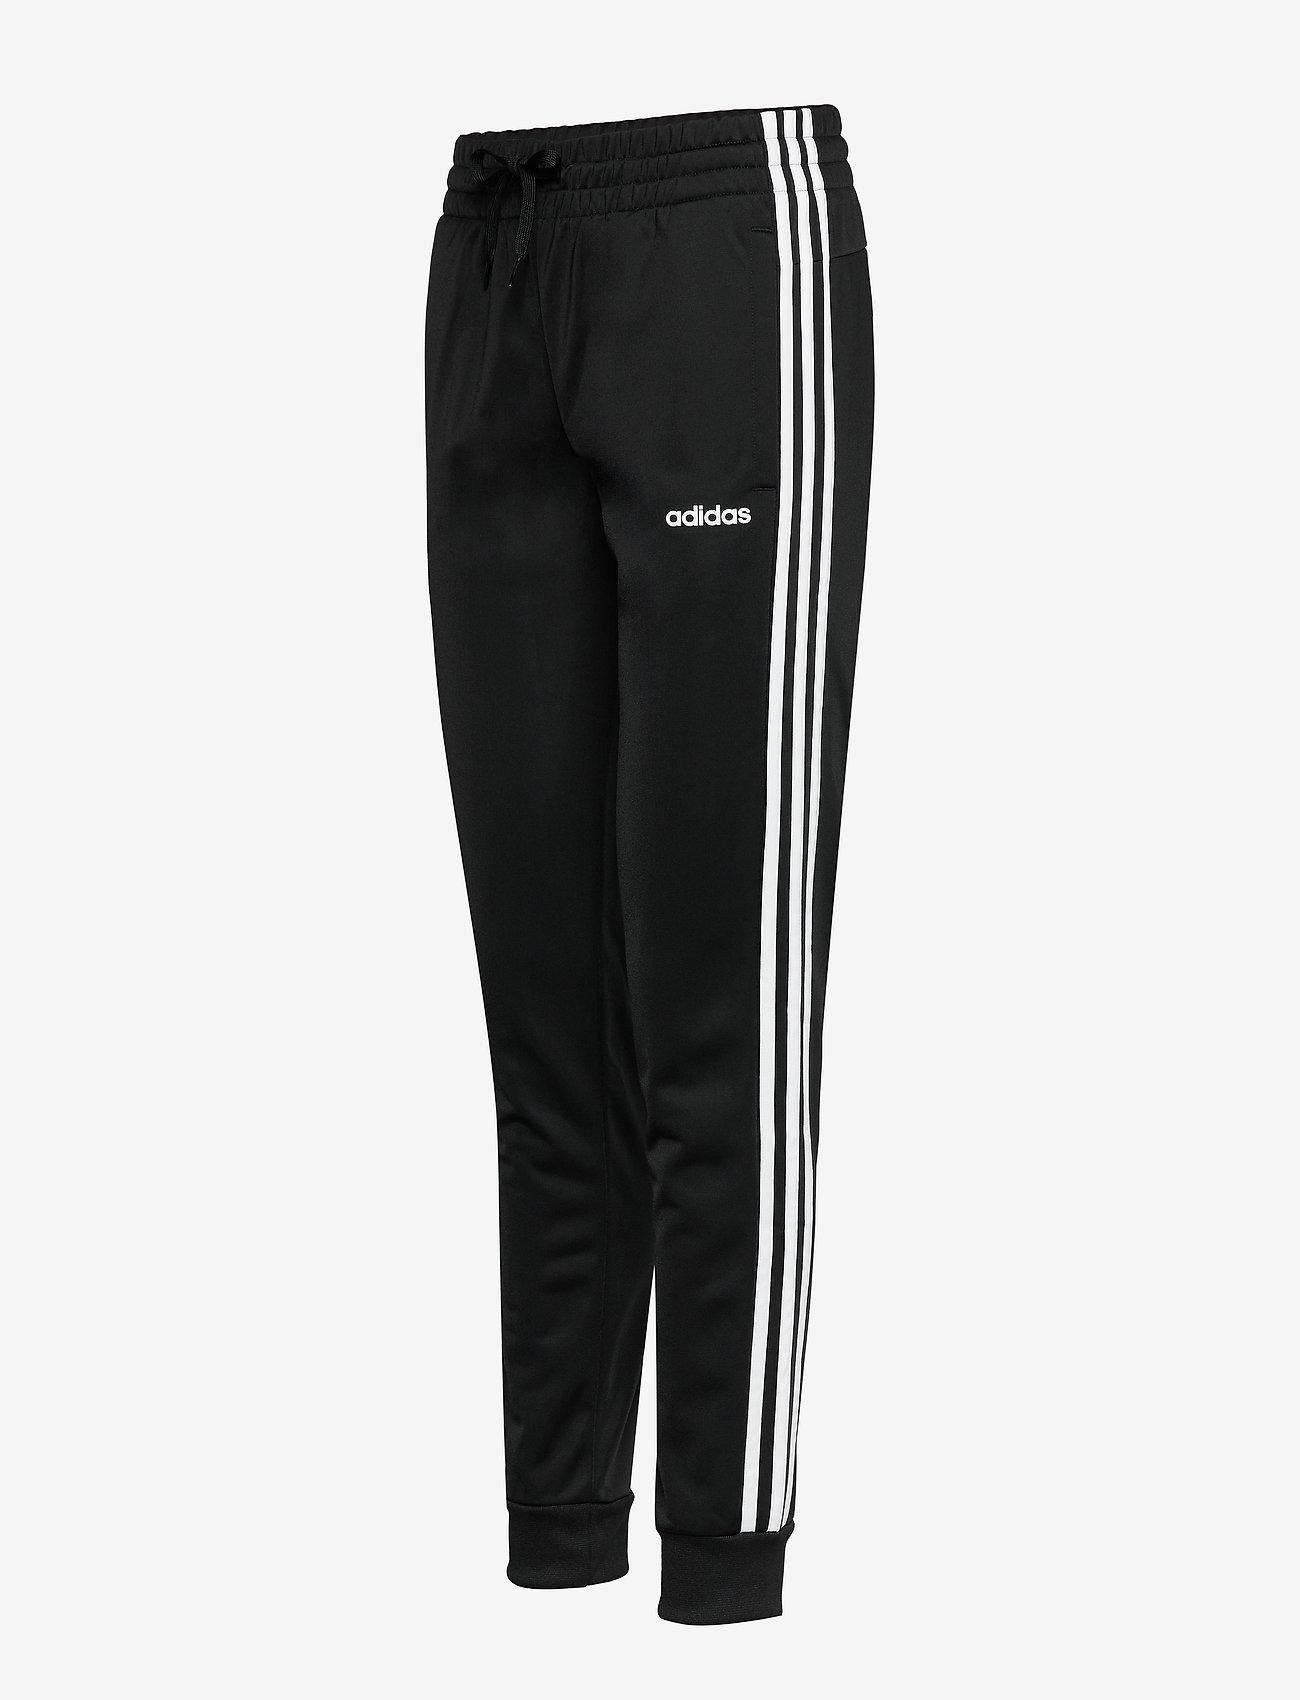 W E 3s Pant Tri (Black/white) (479 kr) - adidas Performance